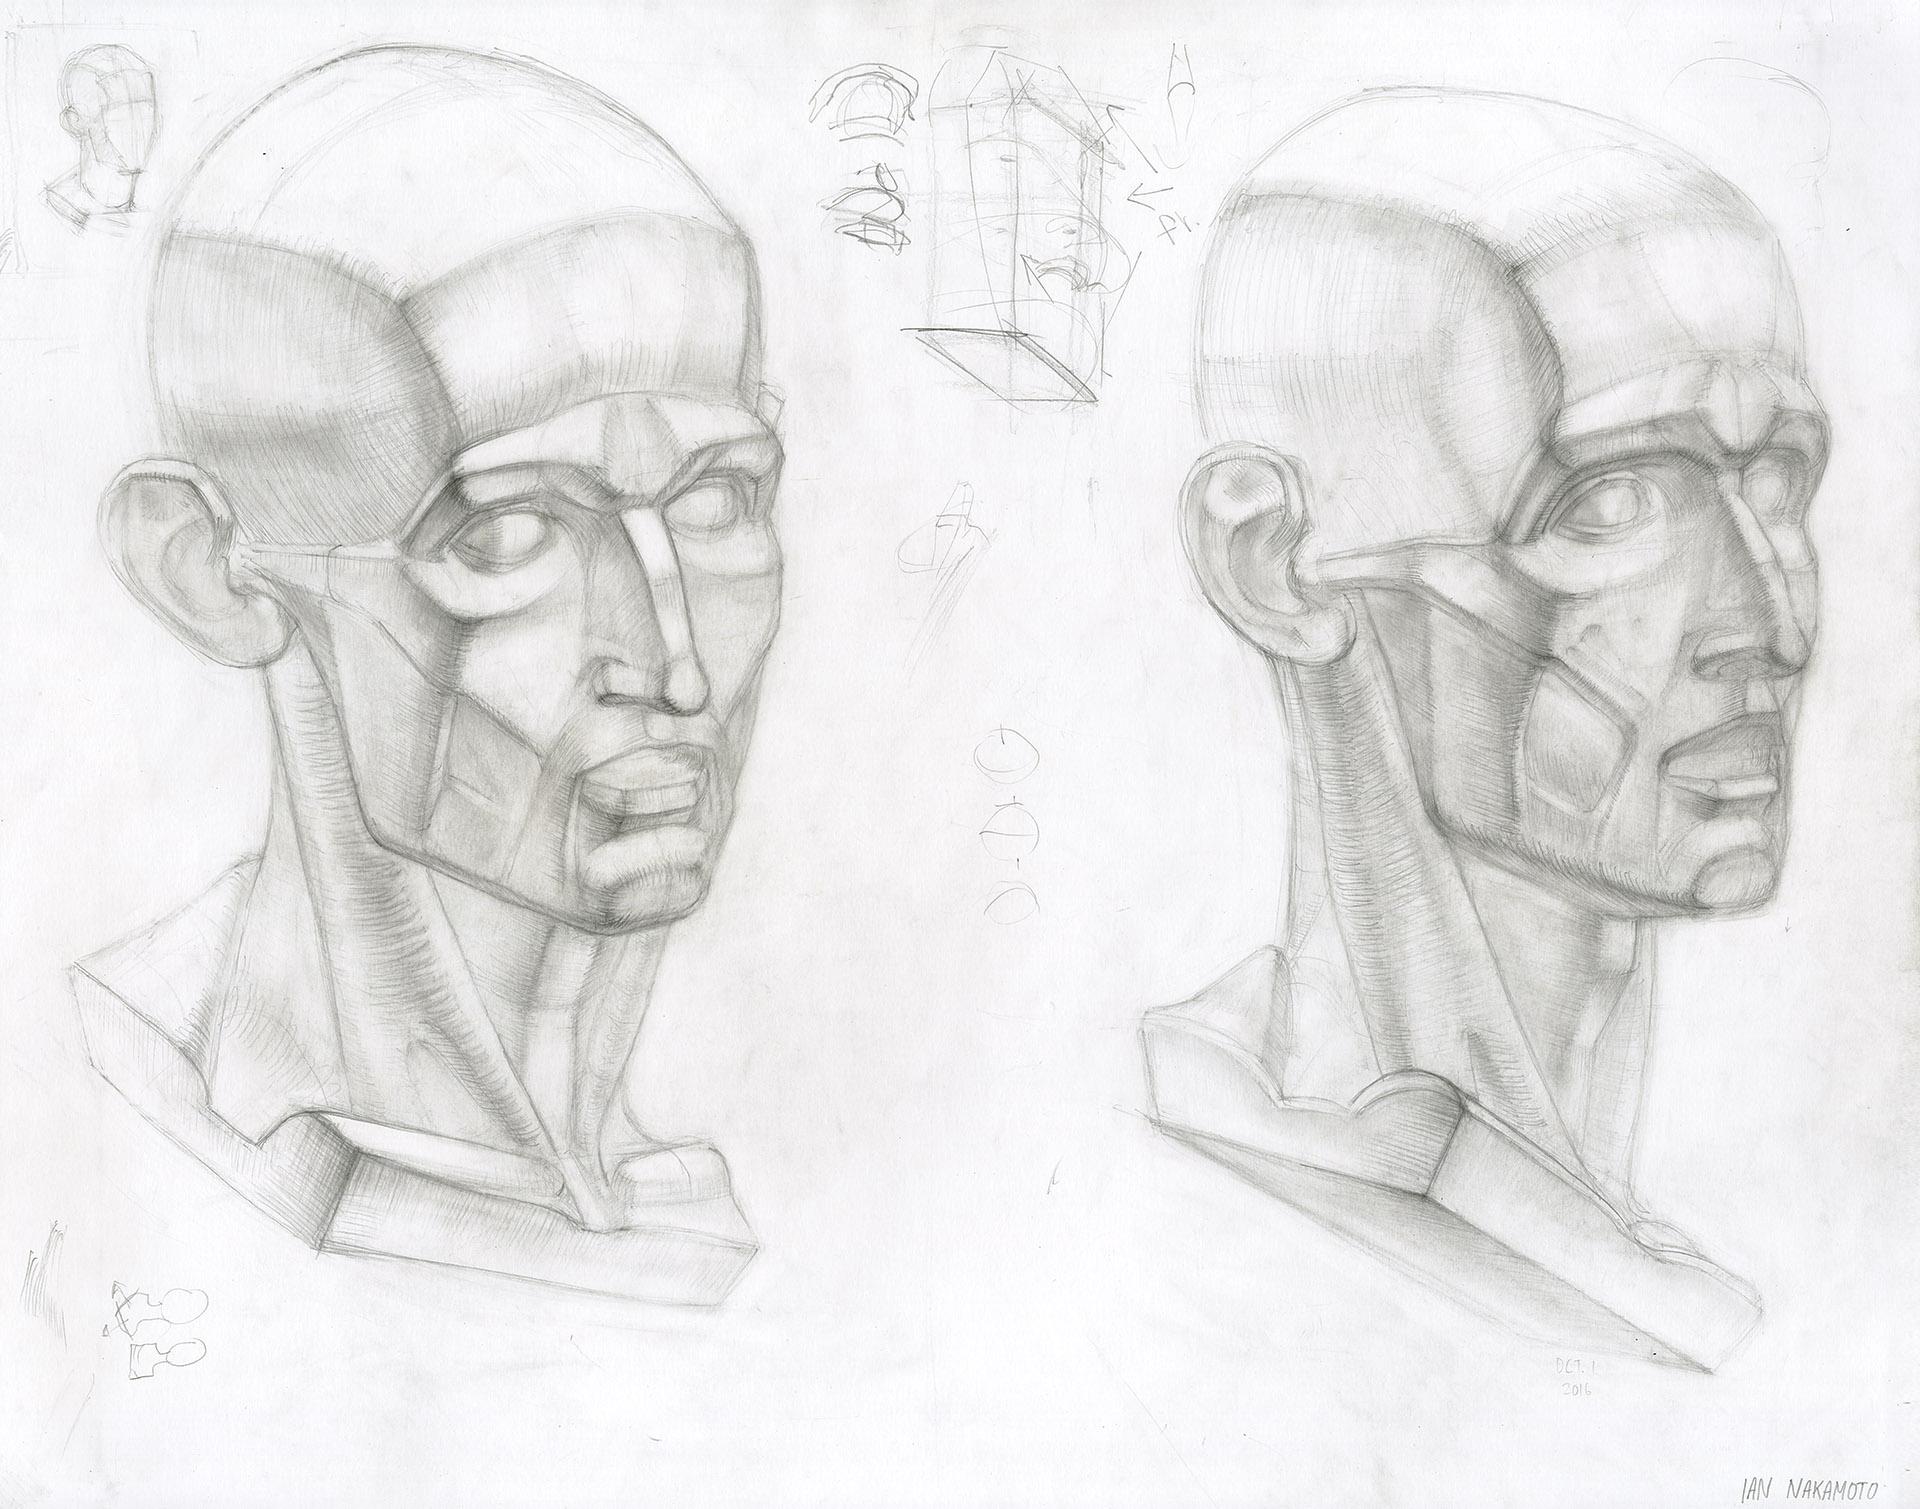 Ian-Nakamoto-Planar-Drawing-Academic-Study-Houdon-Busts-B-1920